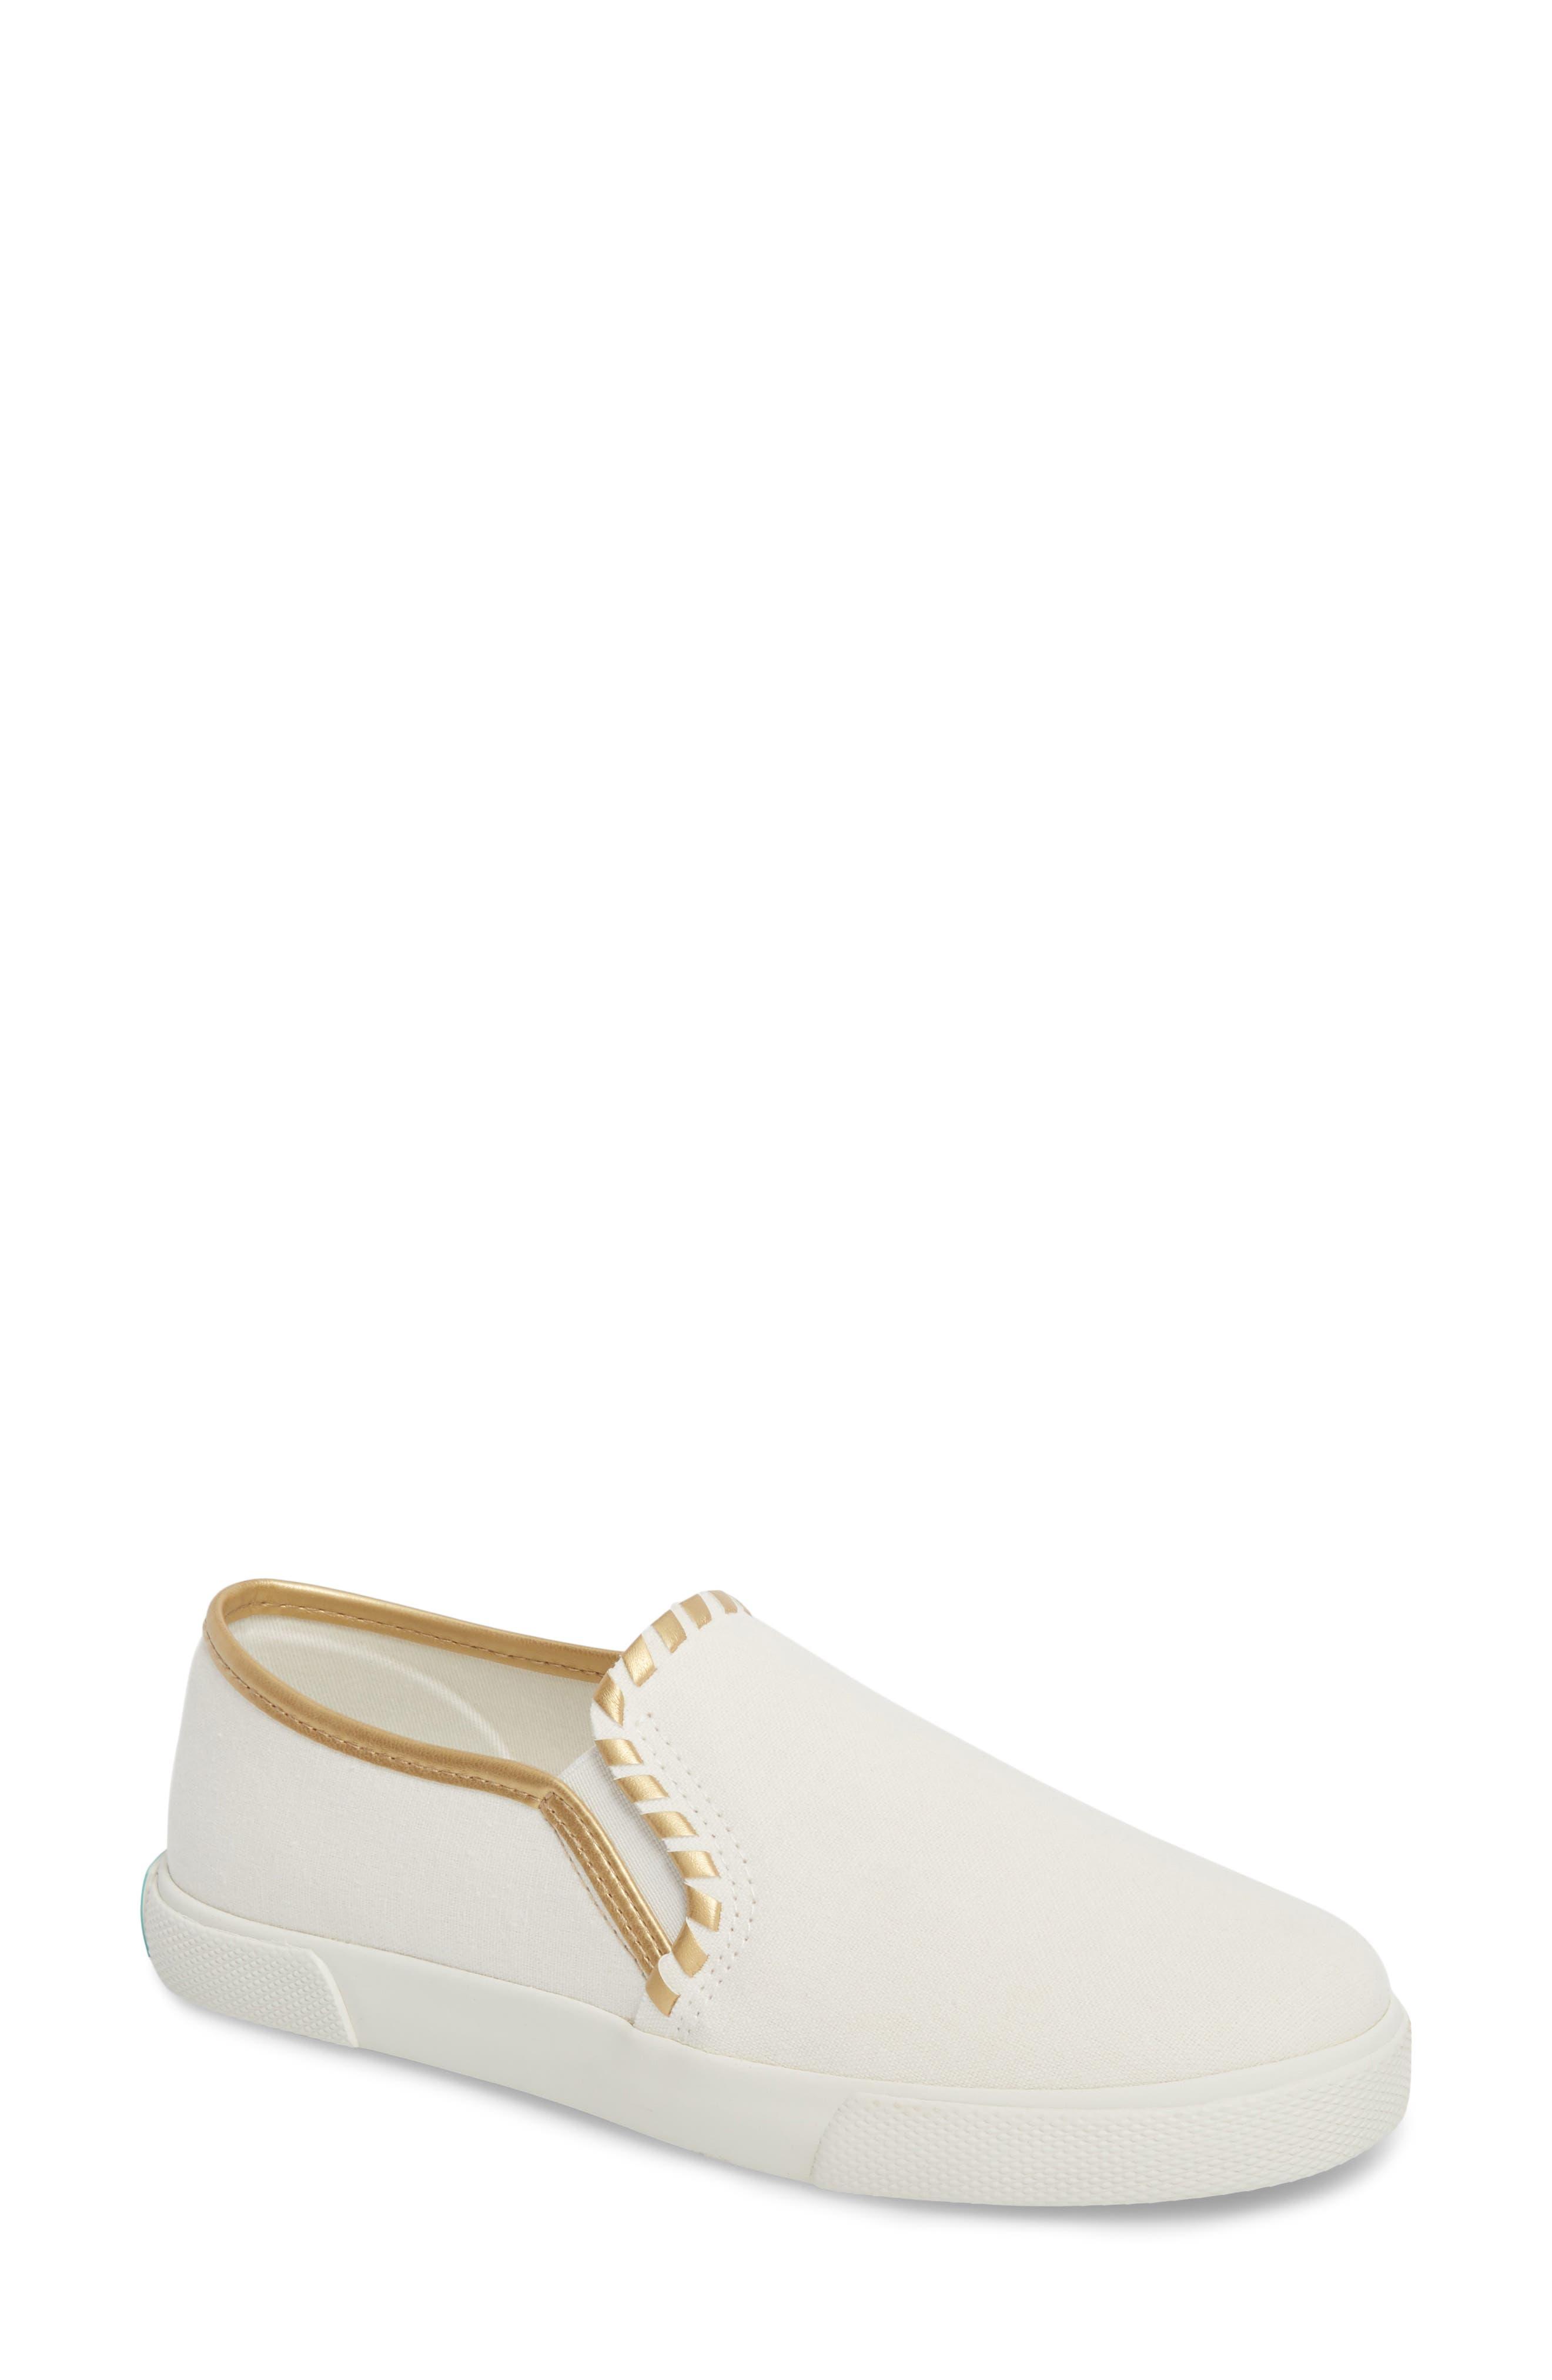 McKay Slip-On Sneaker,                         Main,                         color, WHITE FABRIC